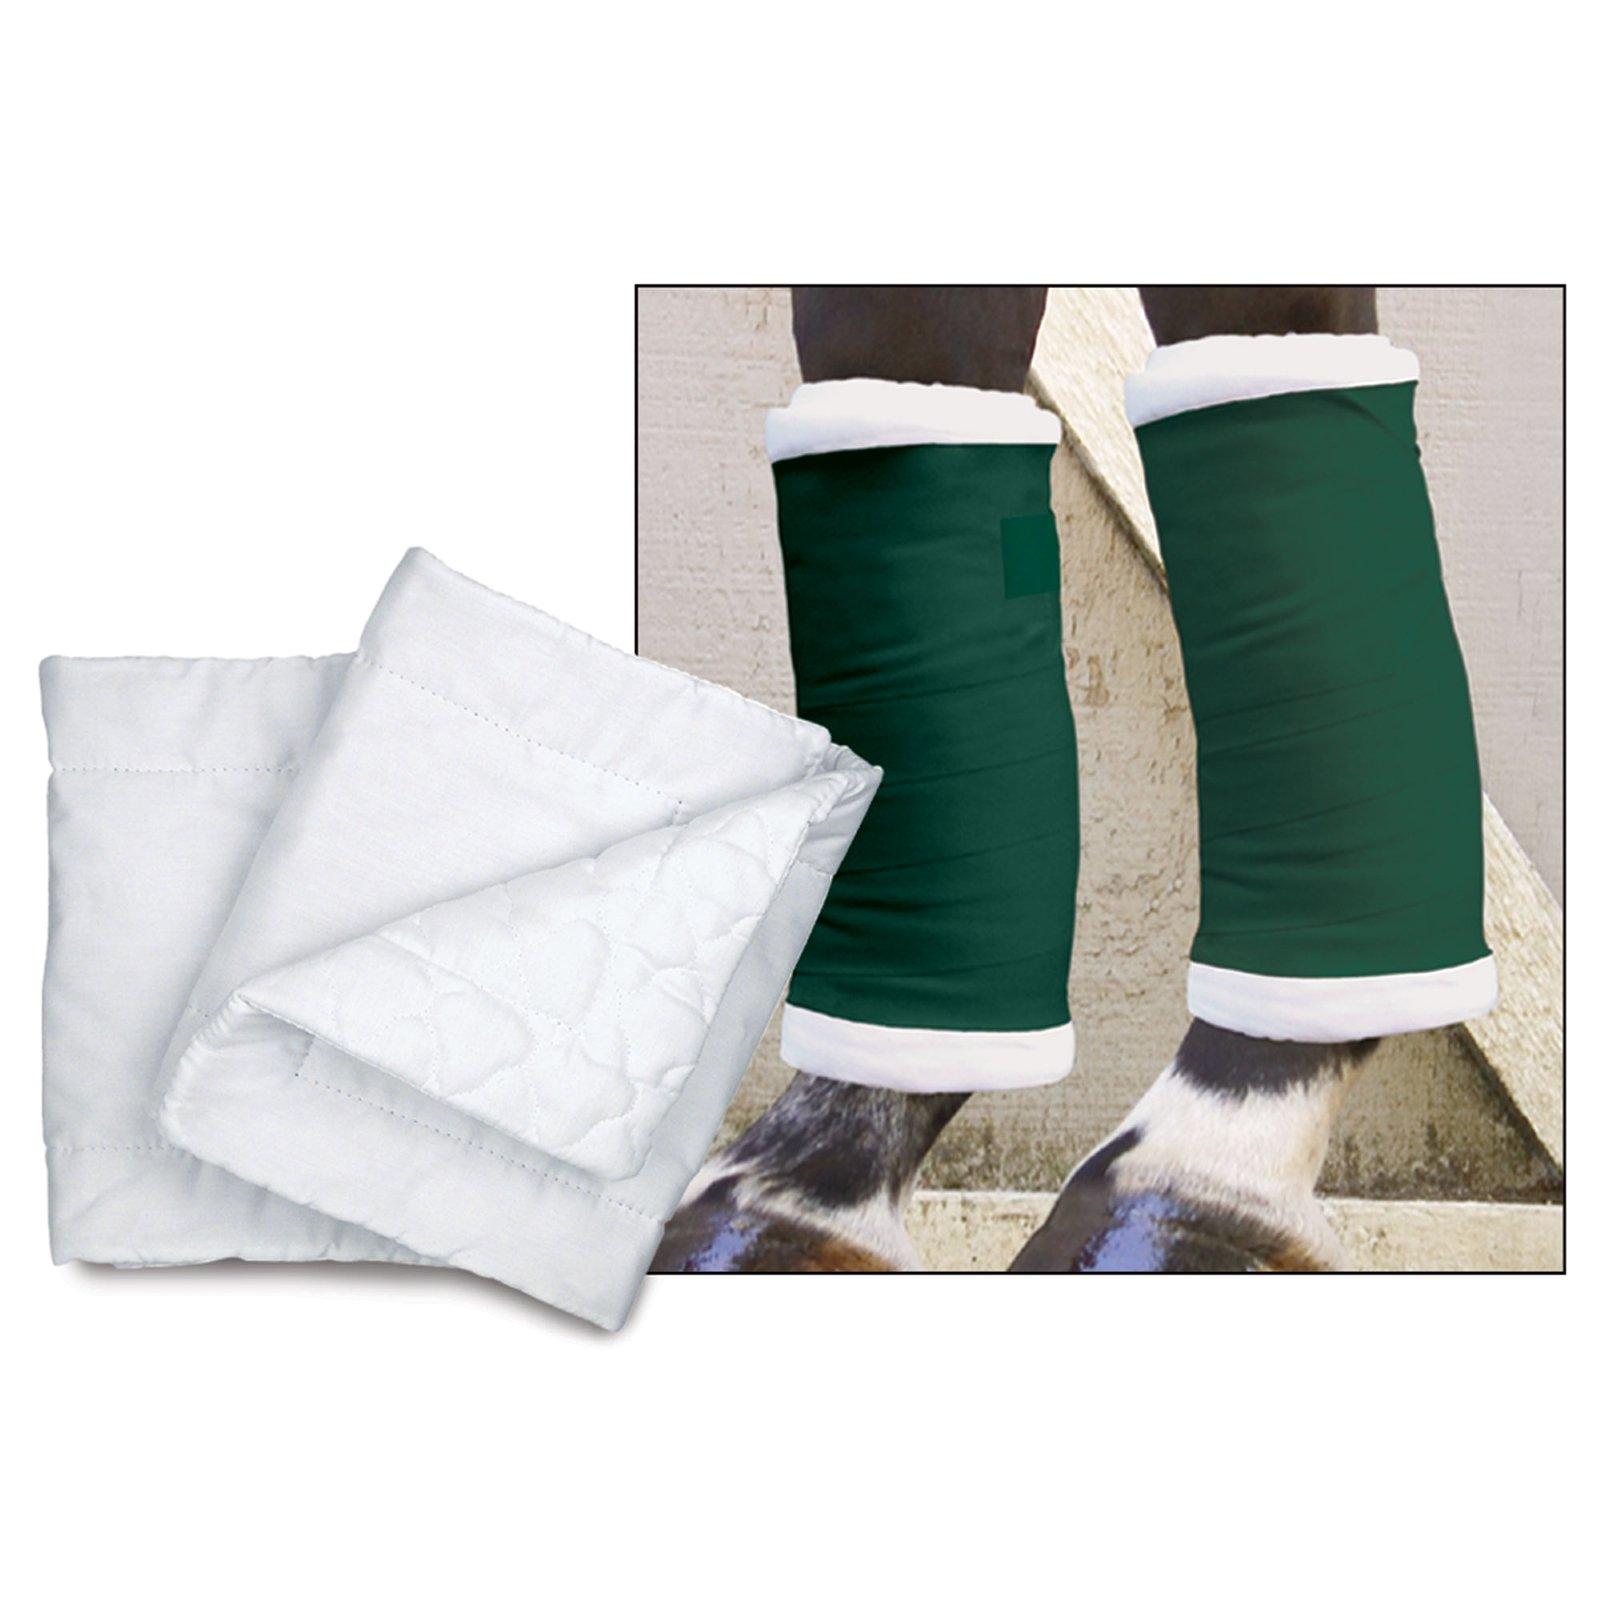 Toklat Premium Quilted Leg Wraps (White, 16'') by Toklat